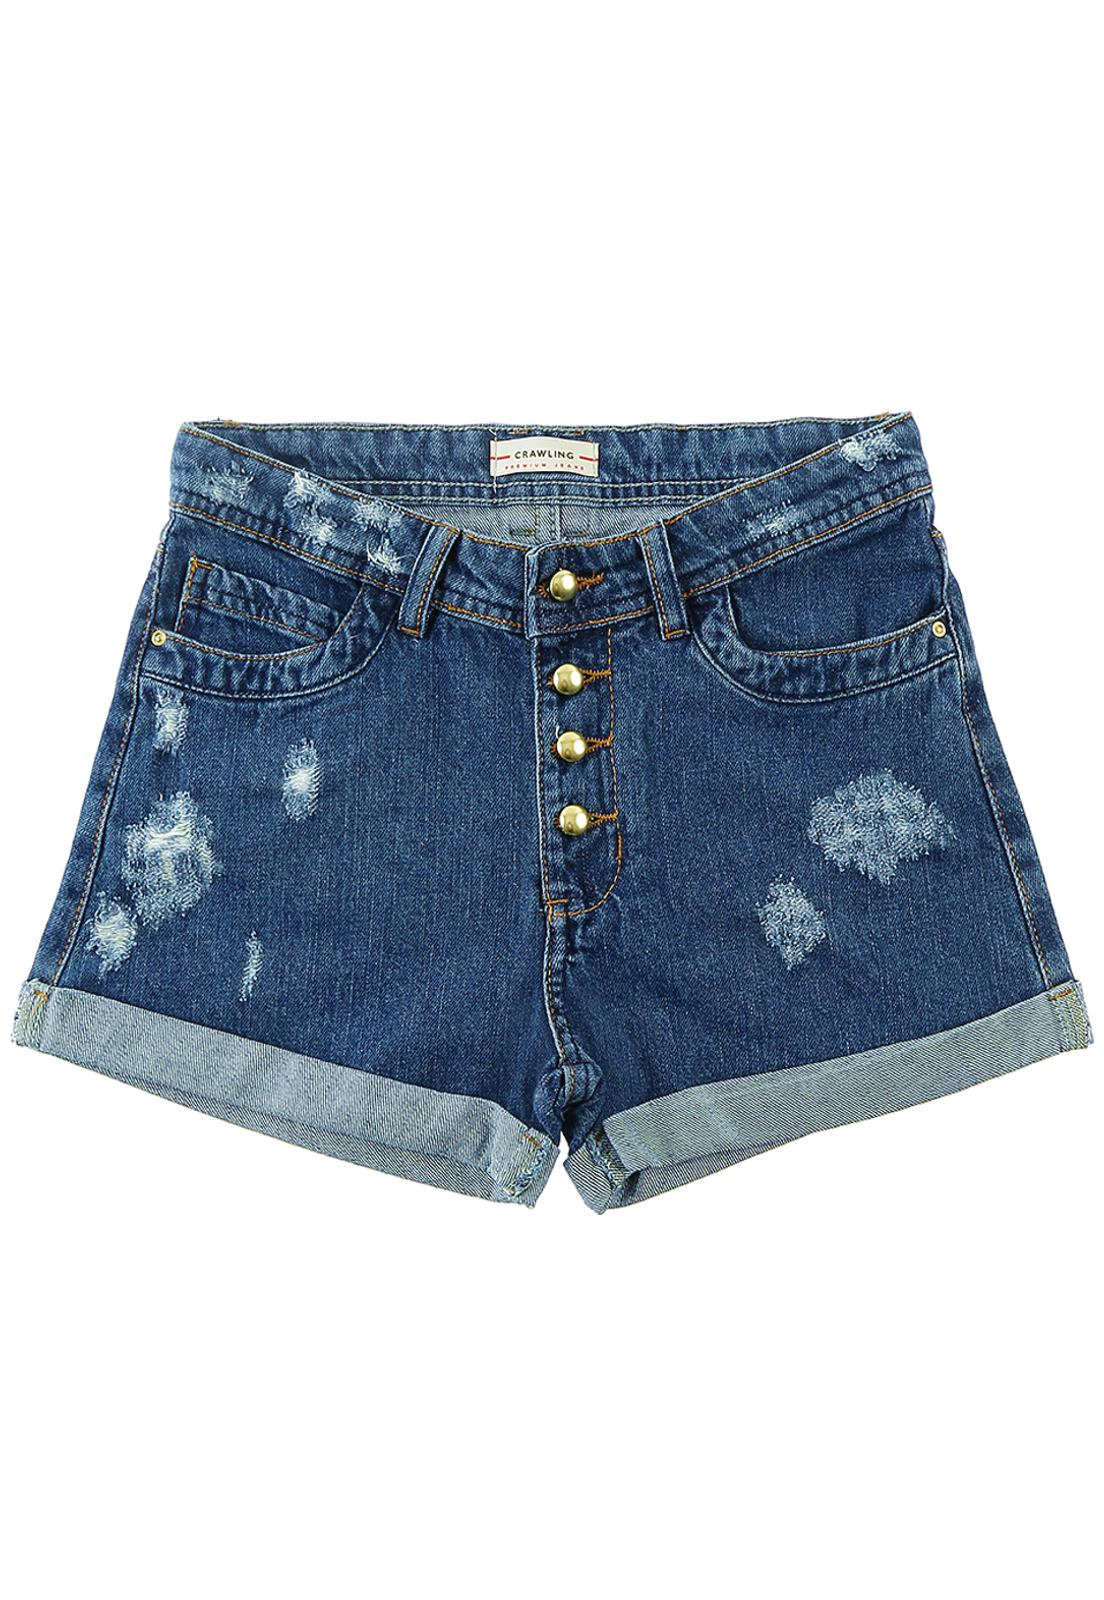 Short Feminino Crawling Jeans Comfort